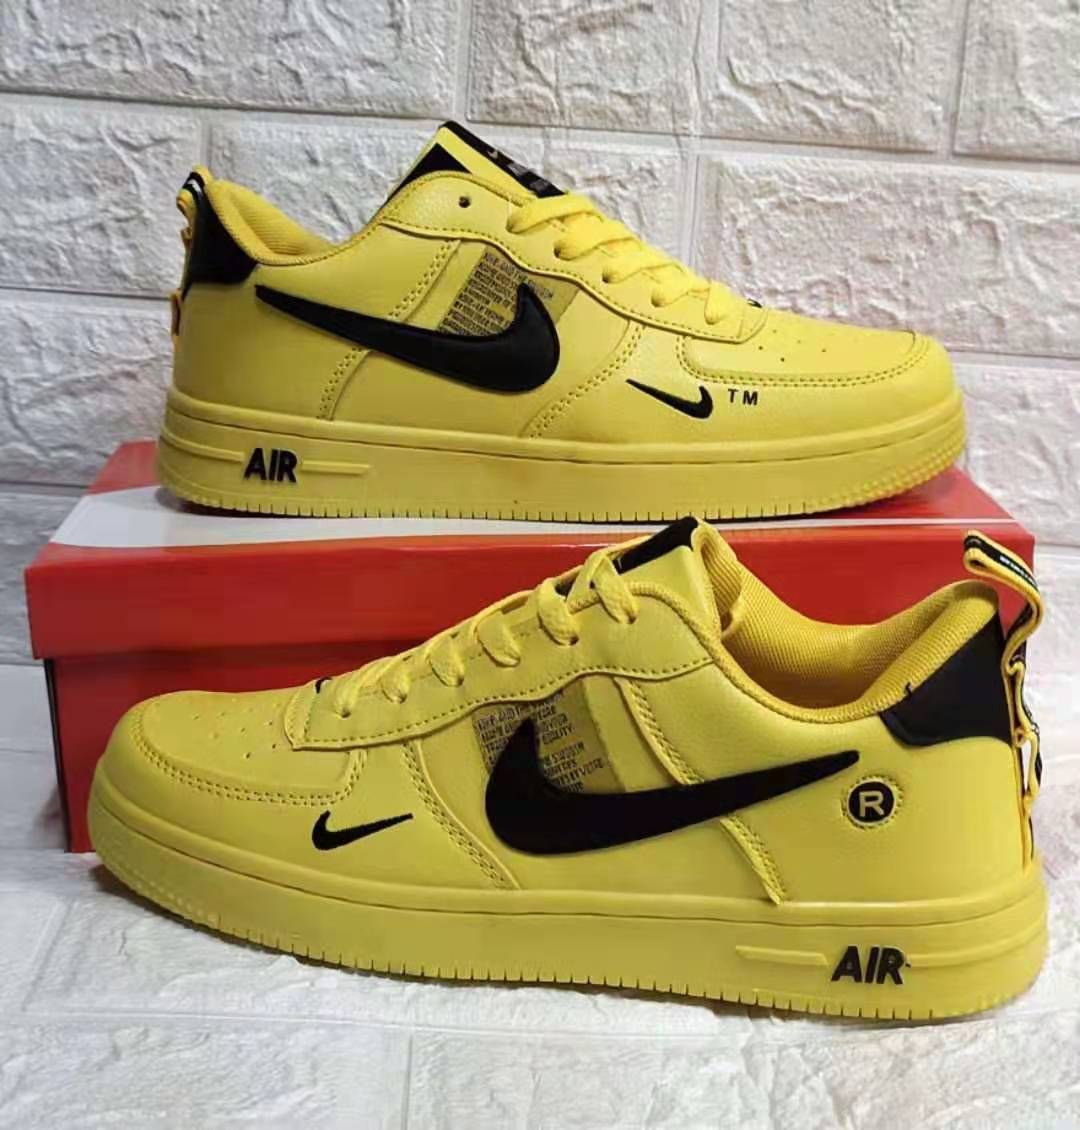 nike Air Force 1 Fashion Low Cut Shoes